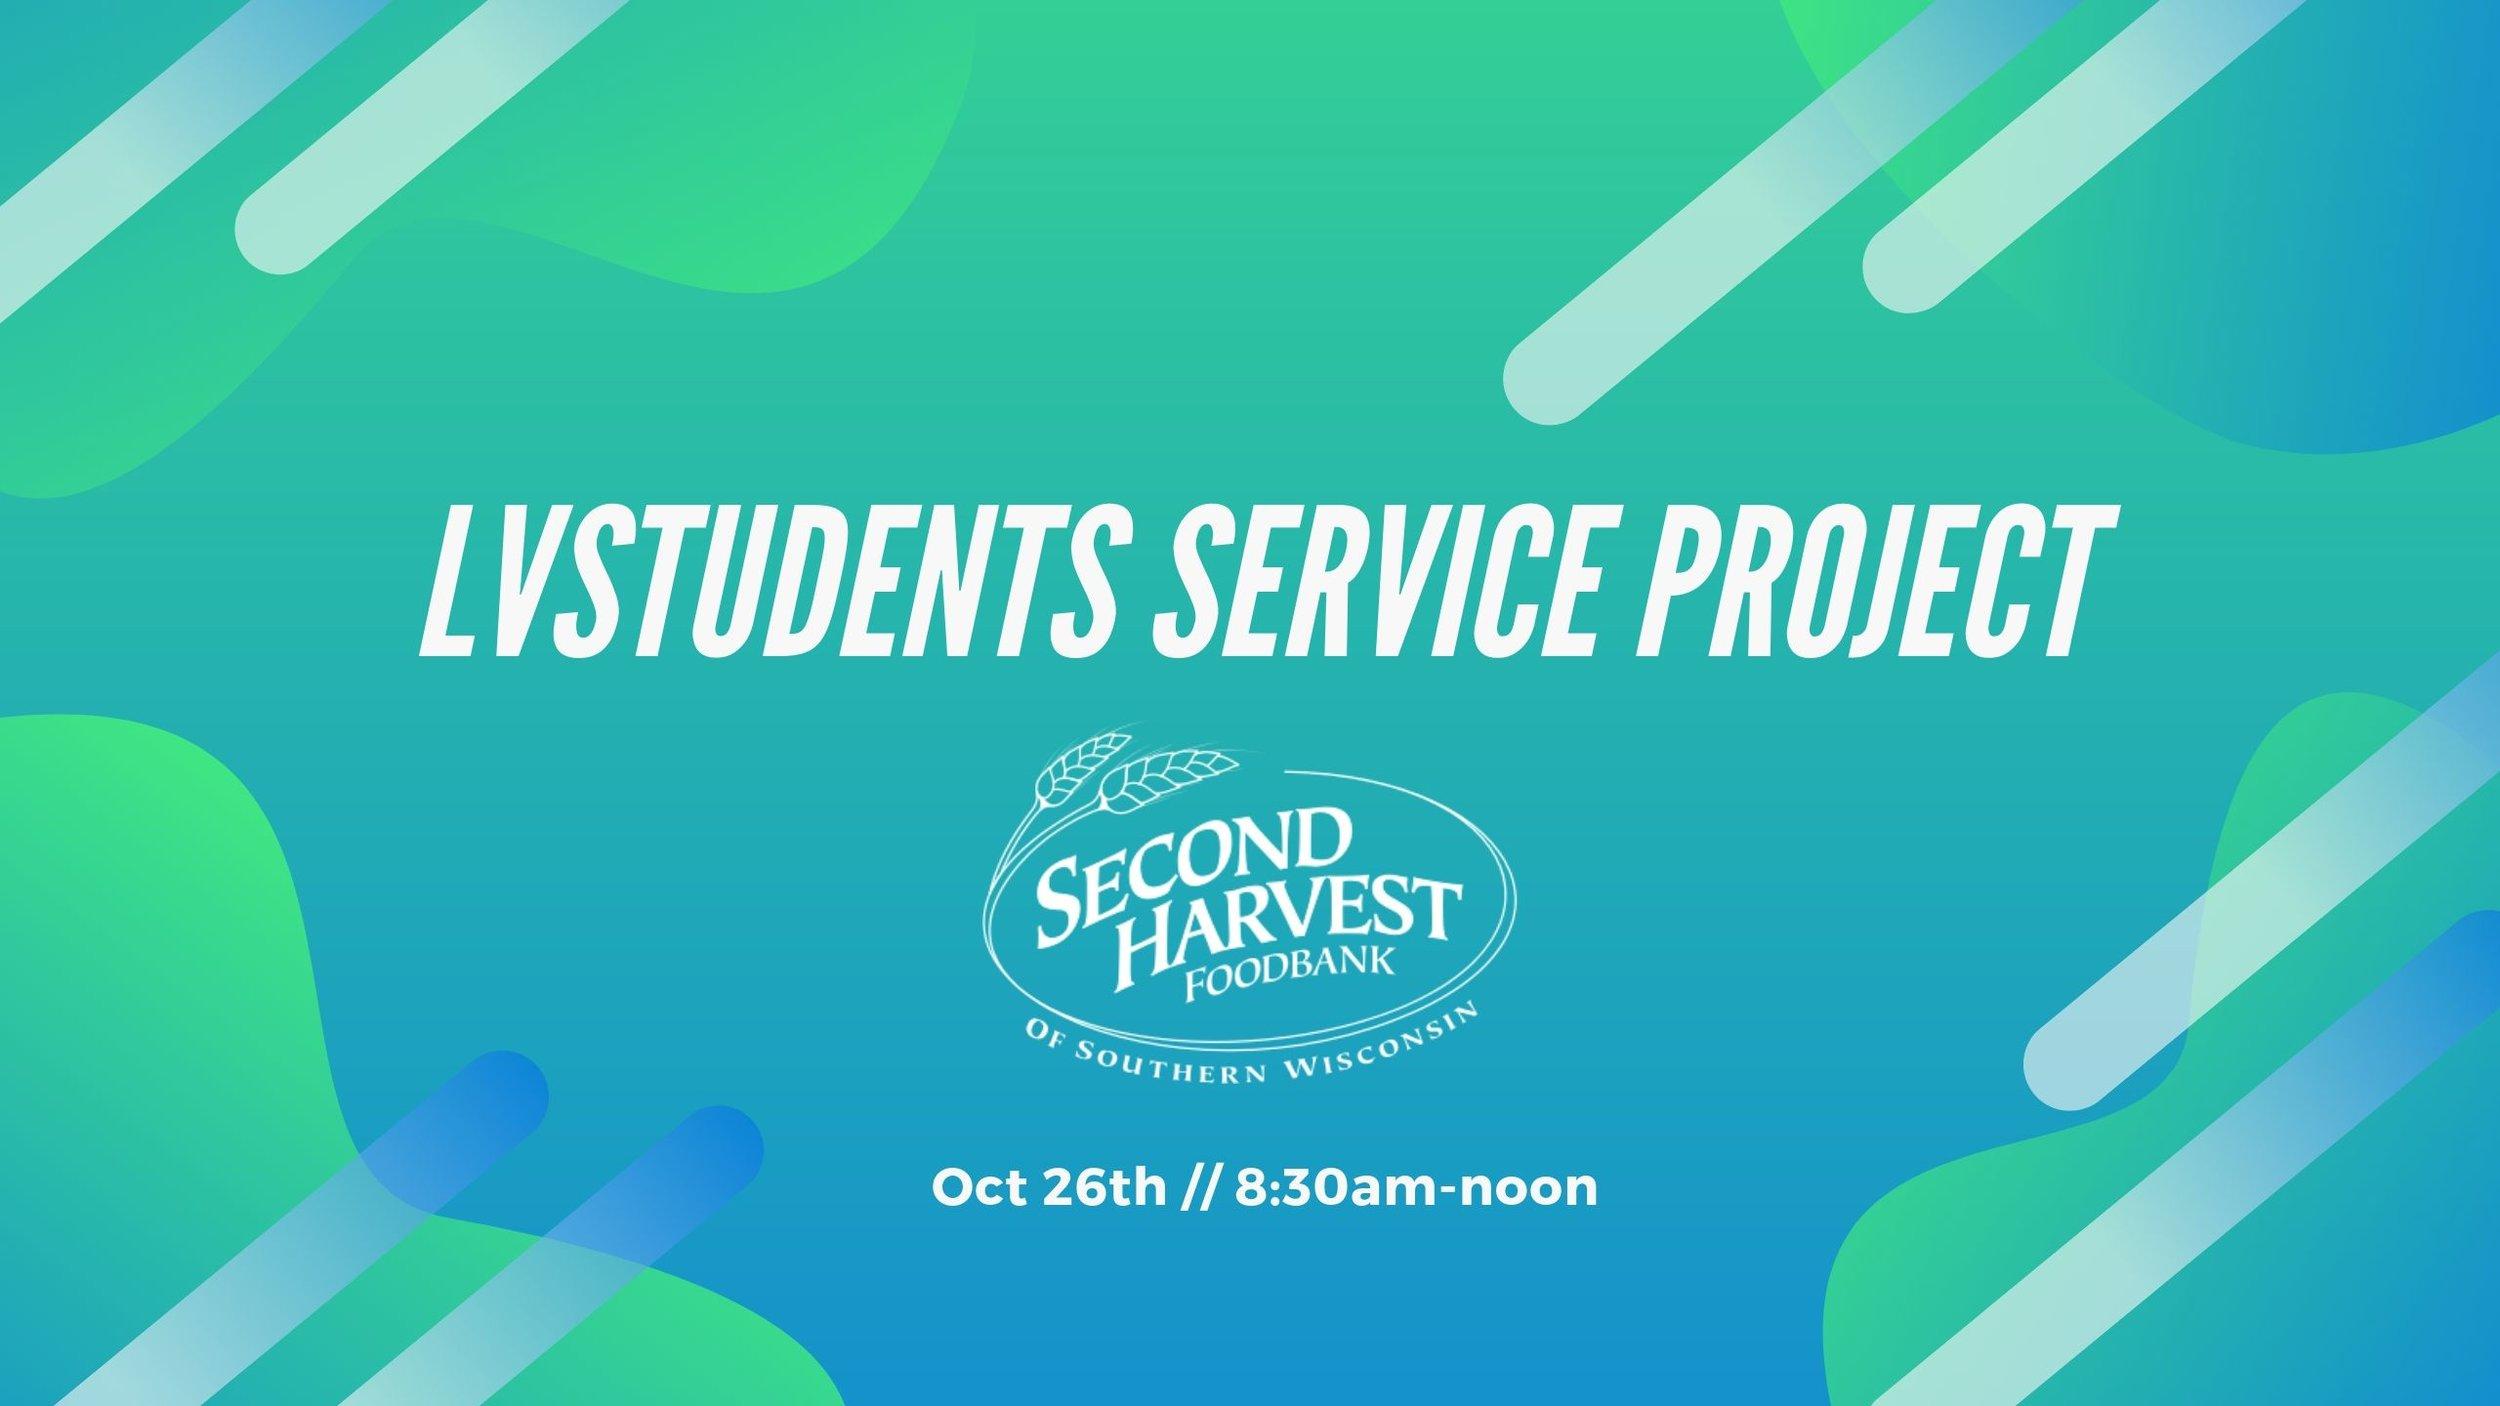 LVStudents Service project.jpg